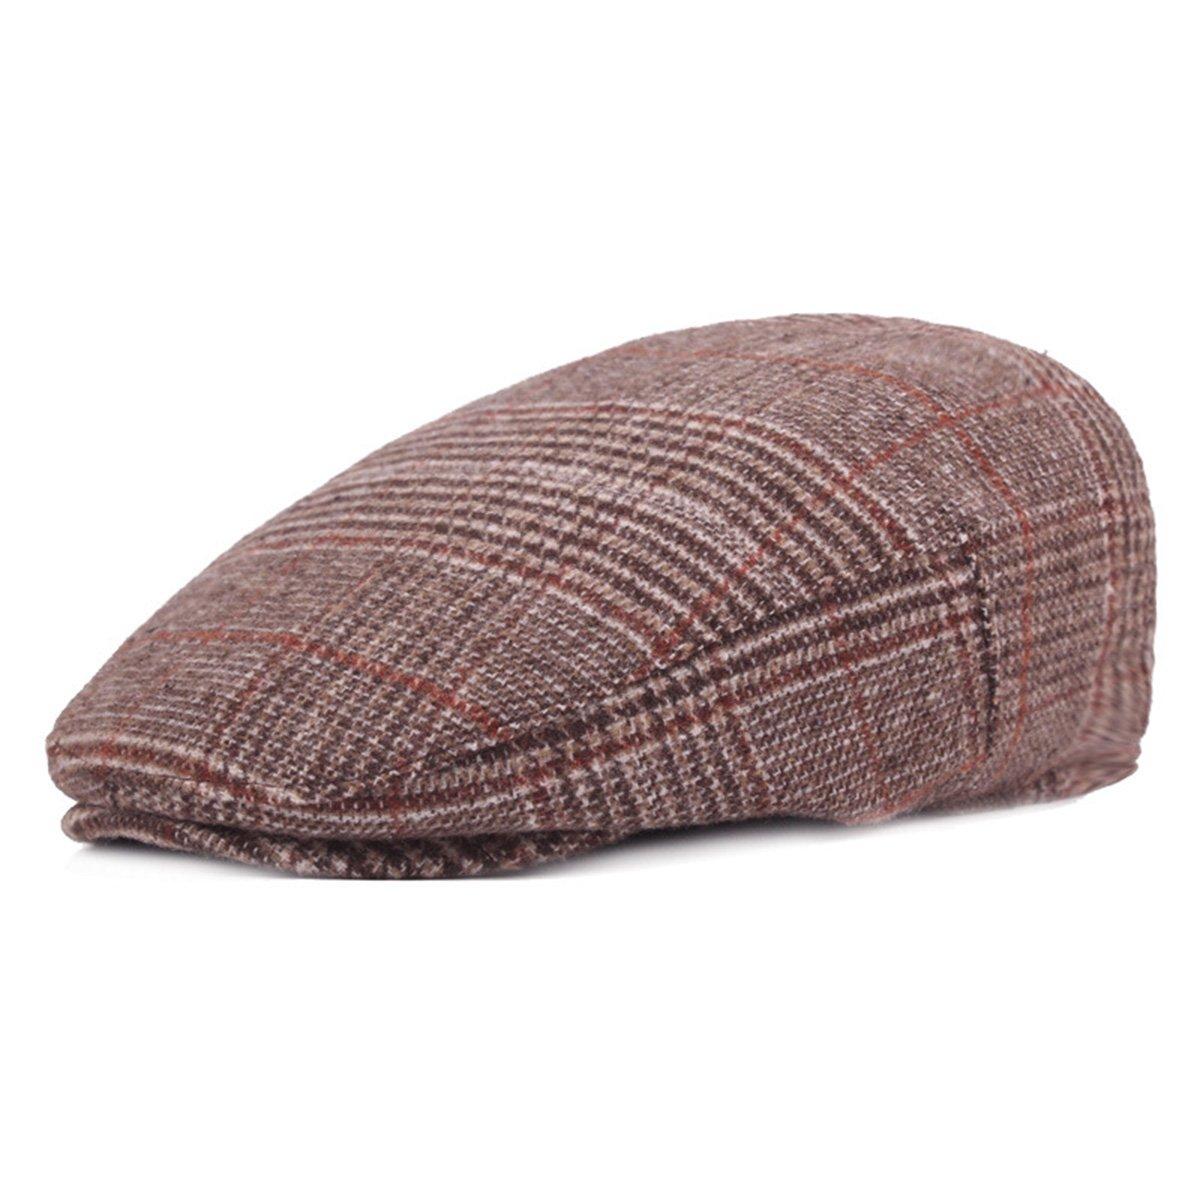 ZLSLZ Mens Woolen Plaid Flat Ivy Newsboy Cabbie Gatsby Paperboy Hats Caps For Men